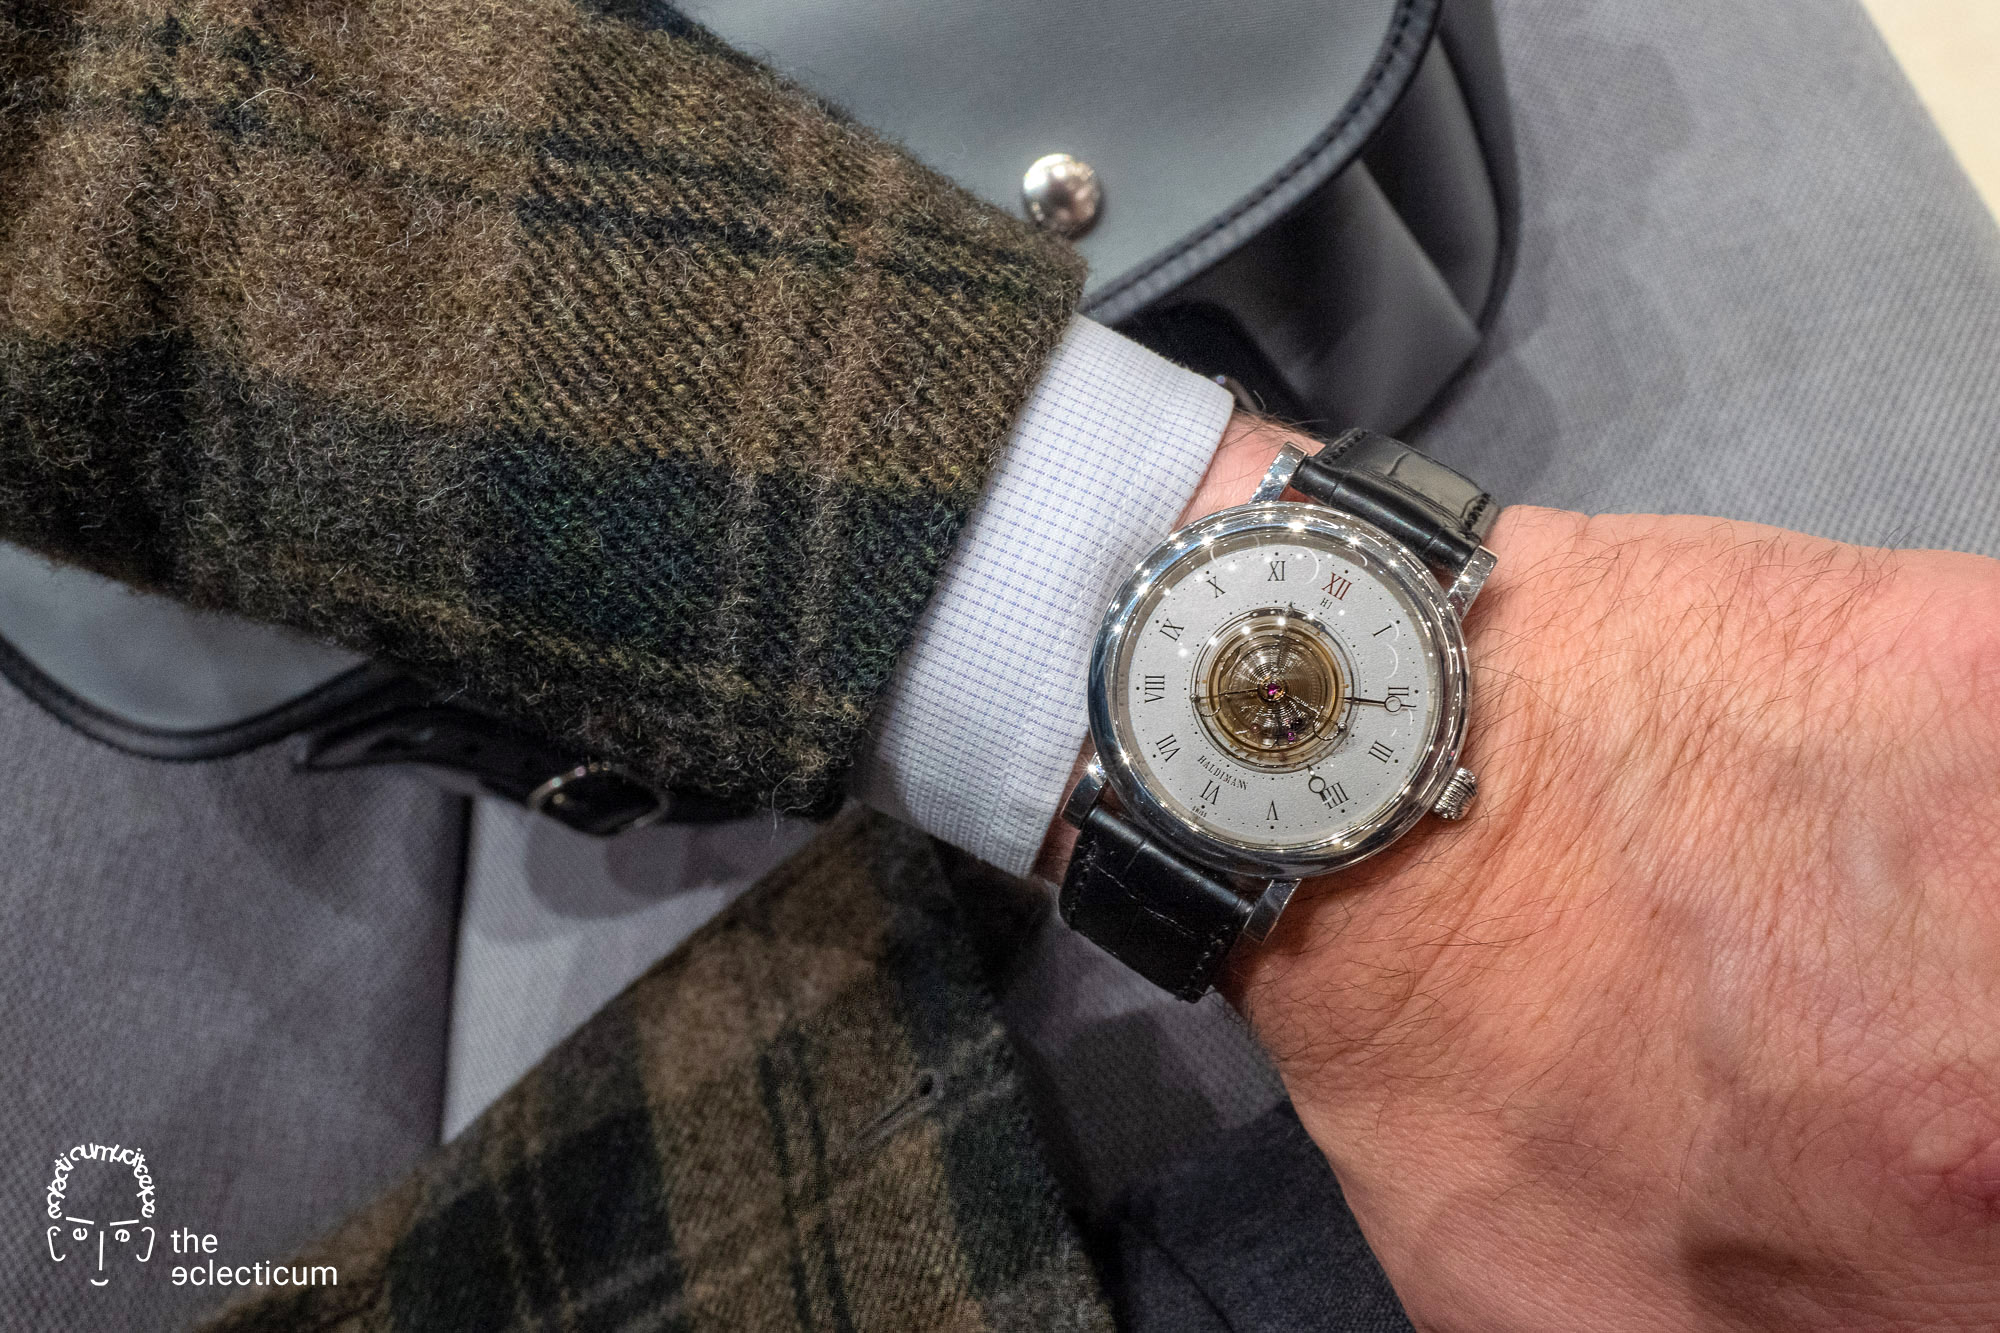 Haldimann H1 Flying central tourbillon ahci independent watchmaking wristshot